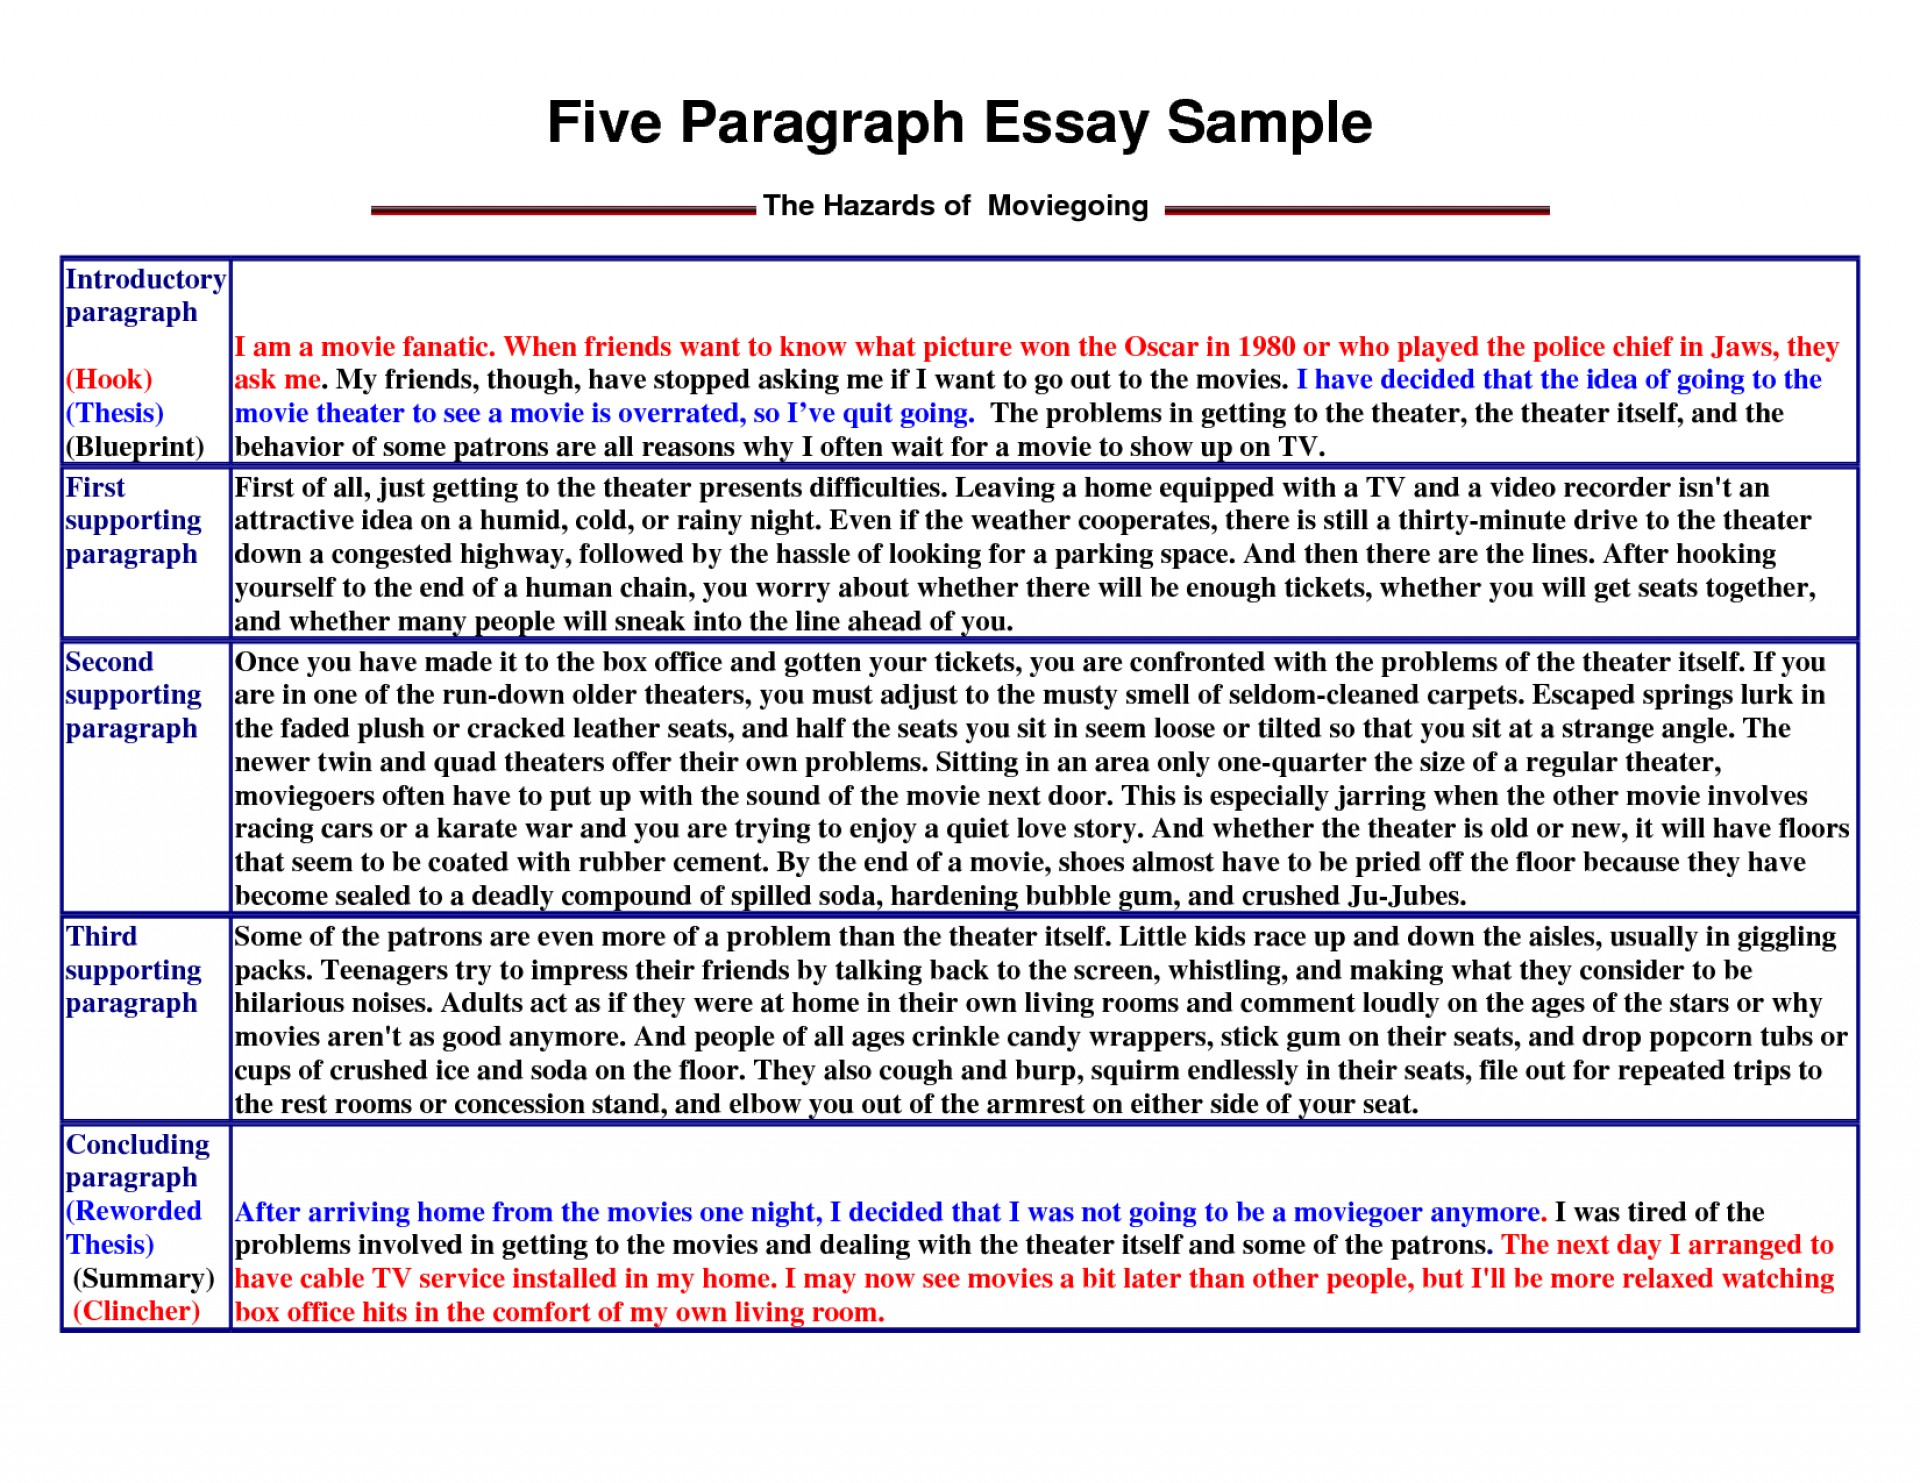 008 Paragraph Essay Sample Example Stirring 5 Free Outline Template Printable Argumentative 1920